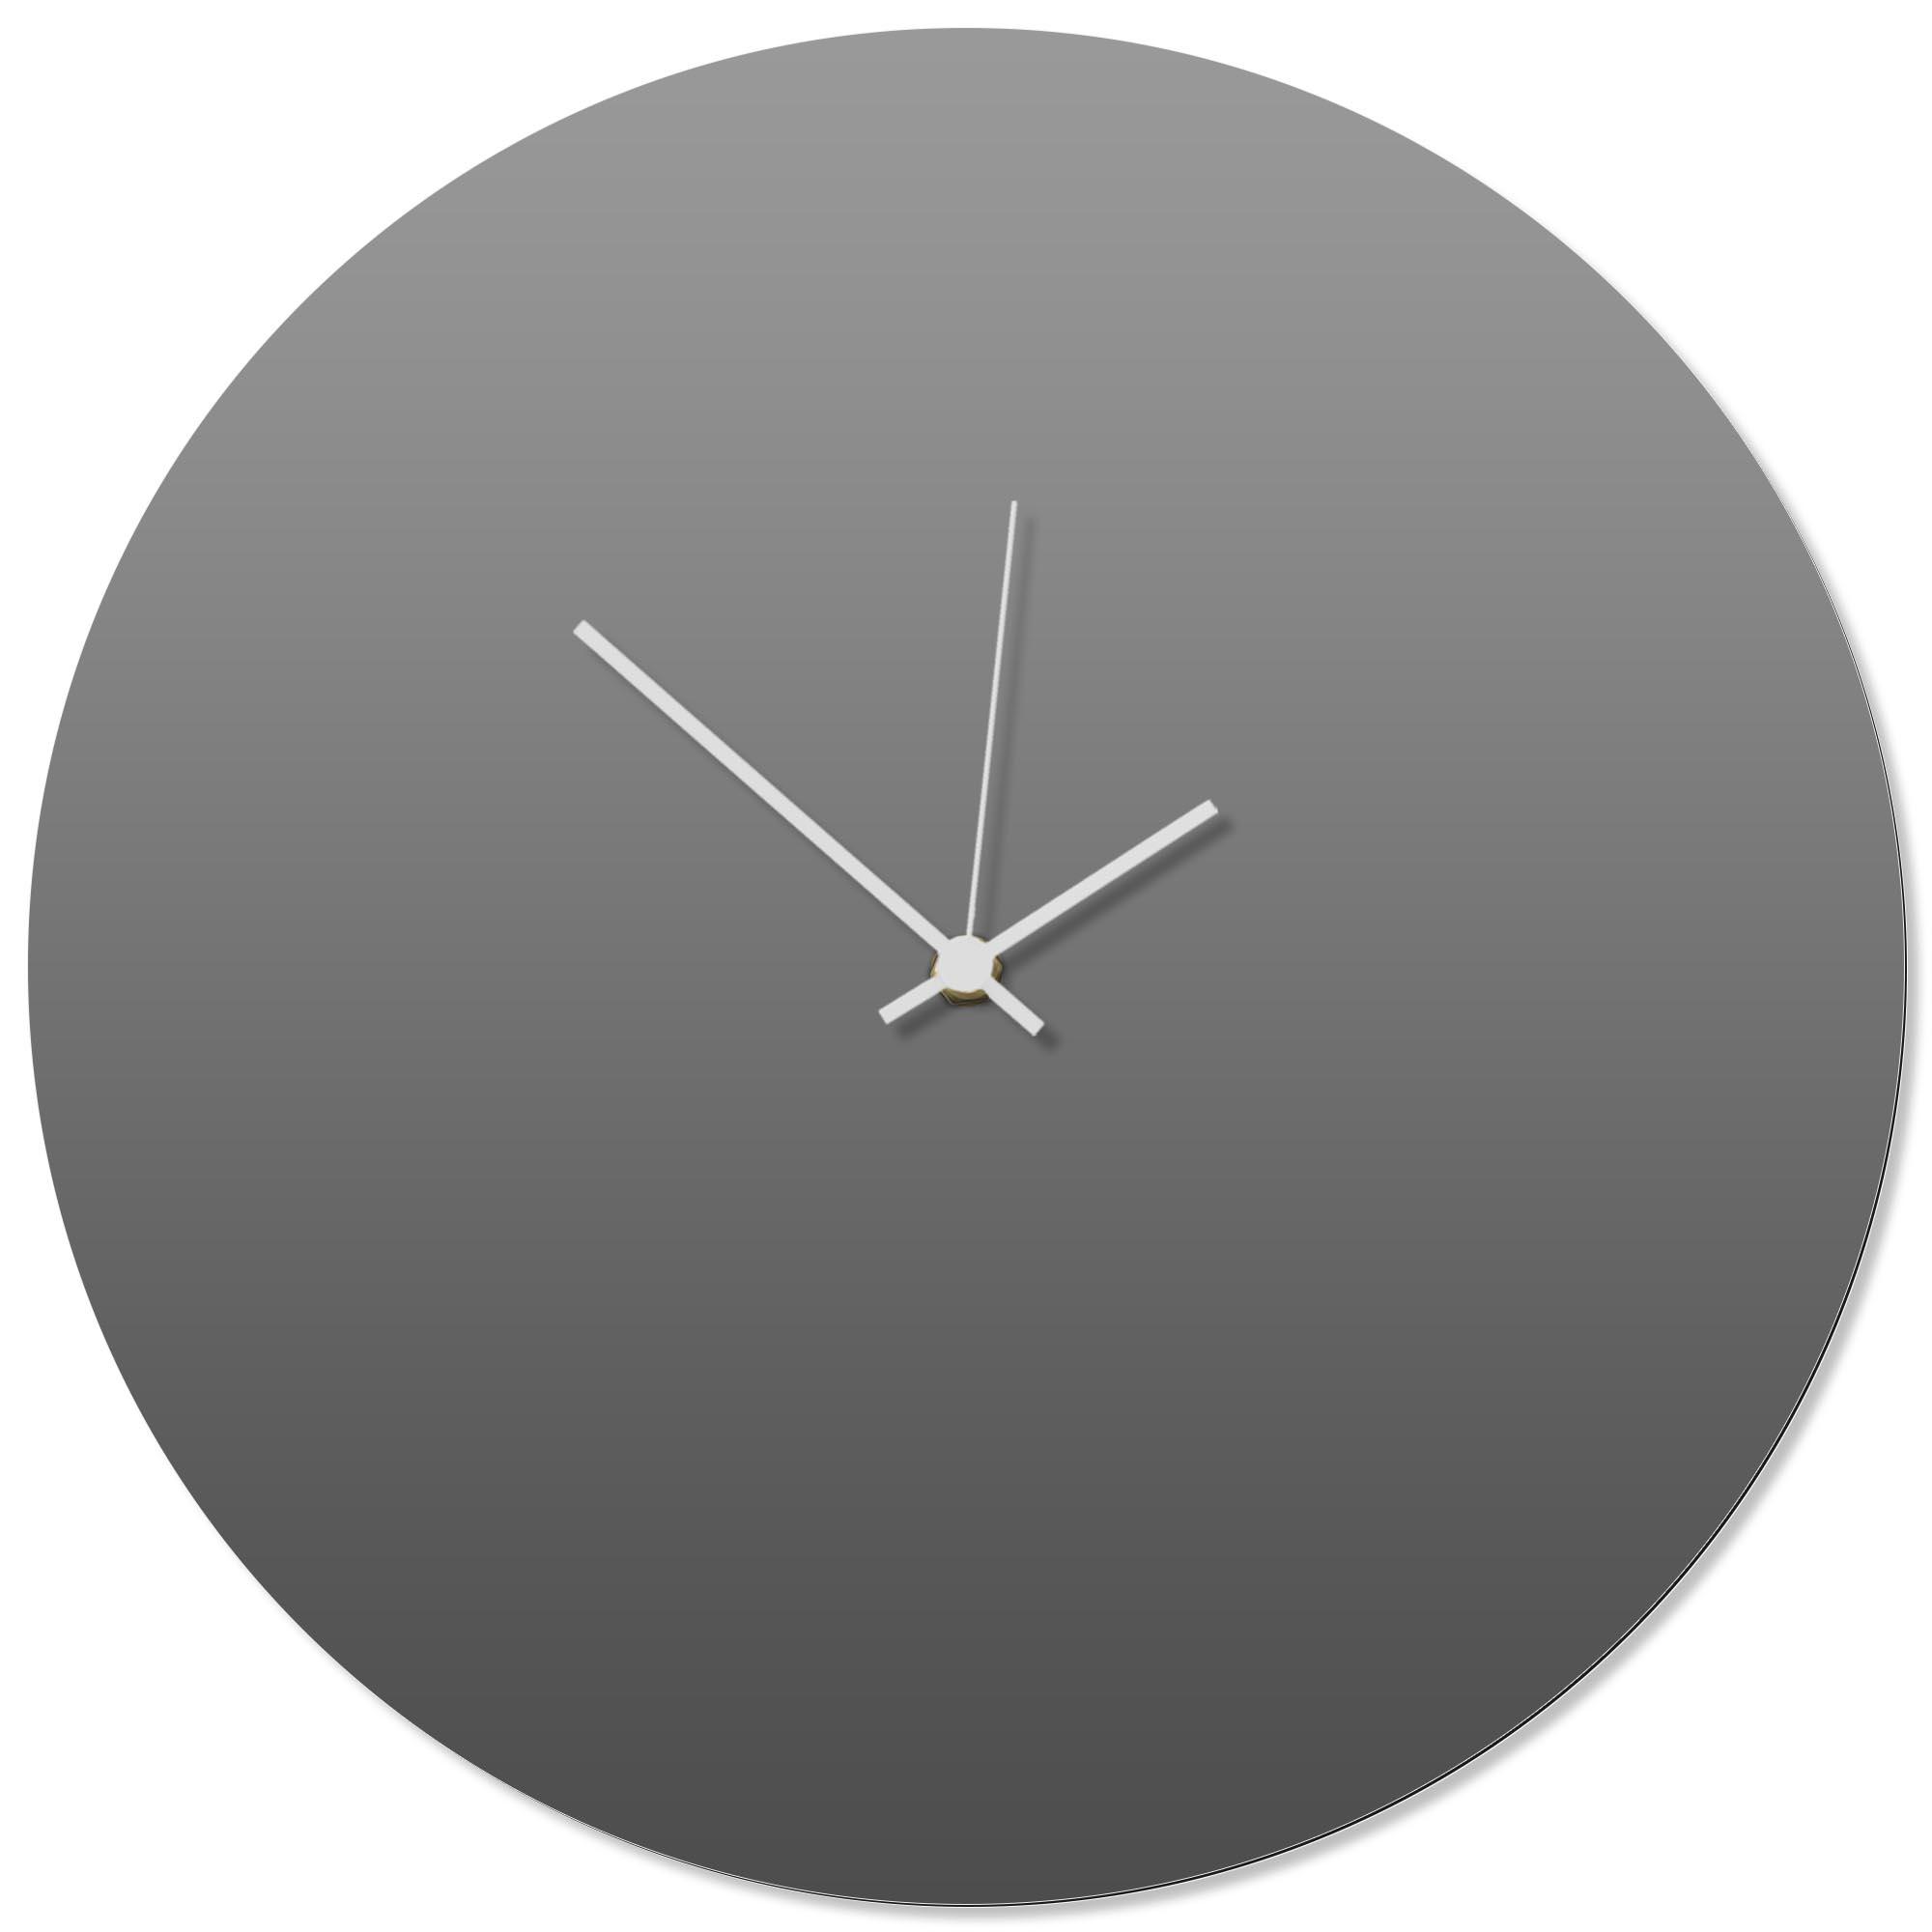 Grayout White Circle Clock 16x16in. Aluminum Polymetal